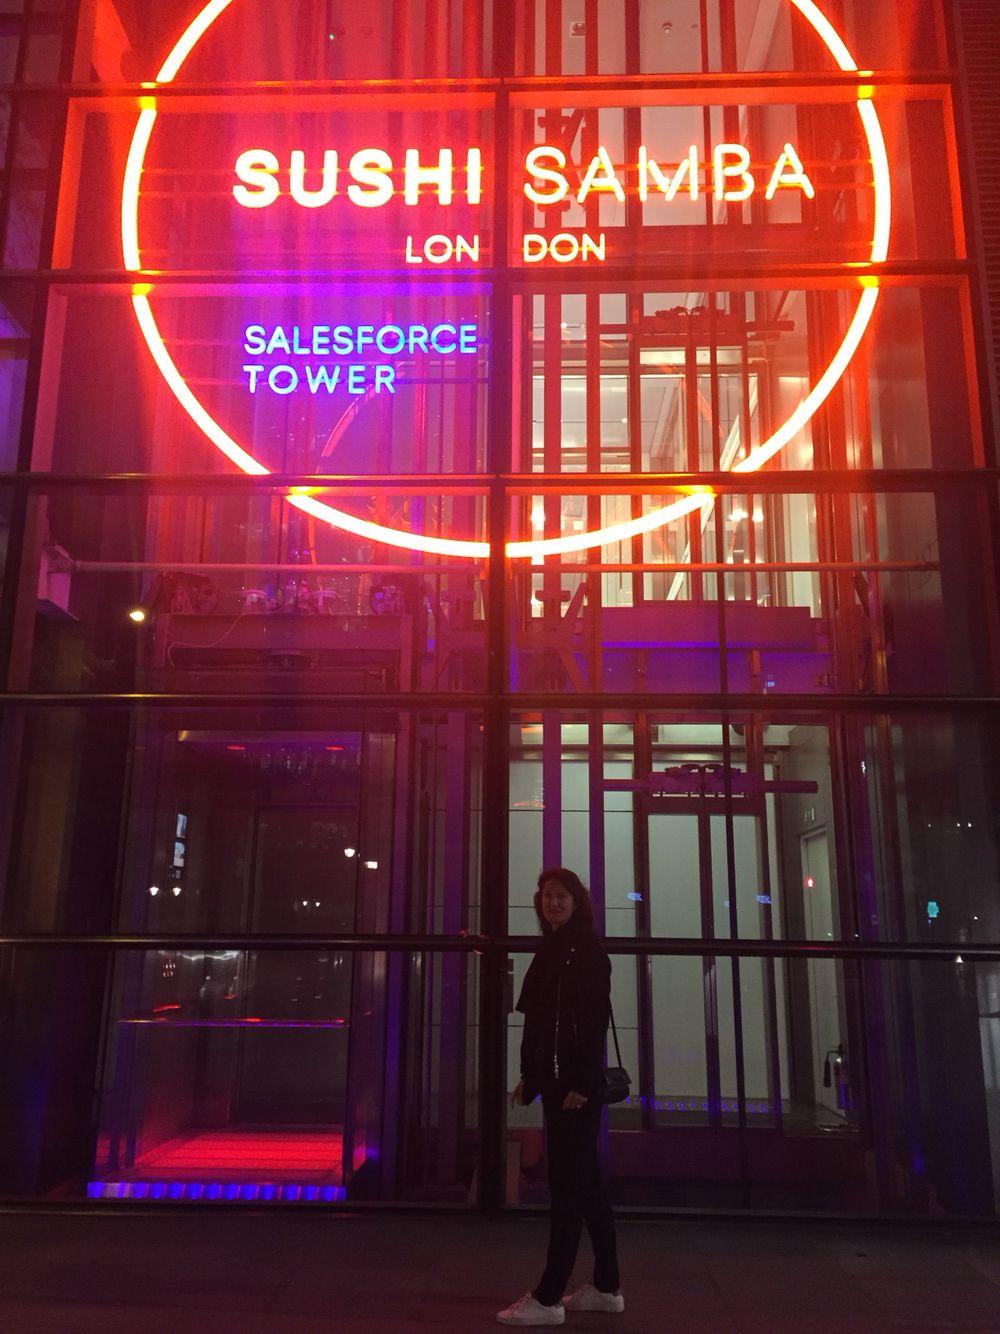 Increibles vistas , sushi increible,barrio soreditch.London at night.